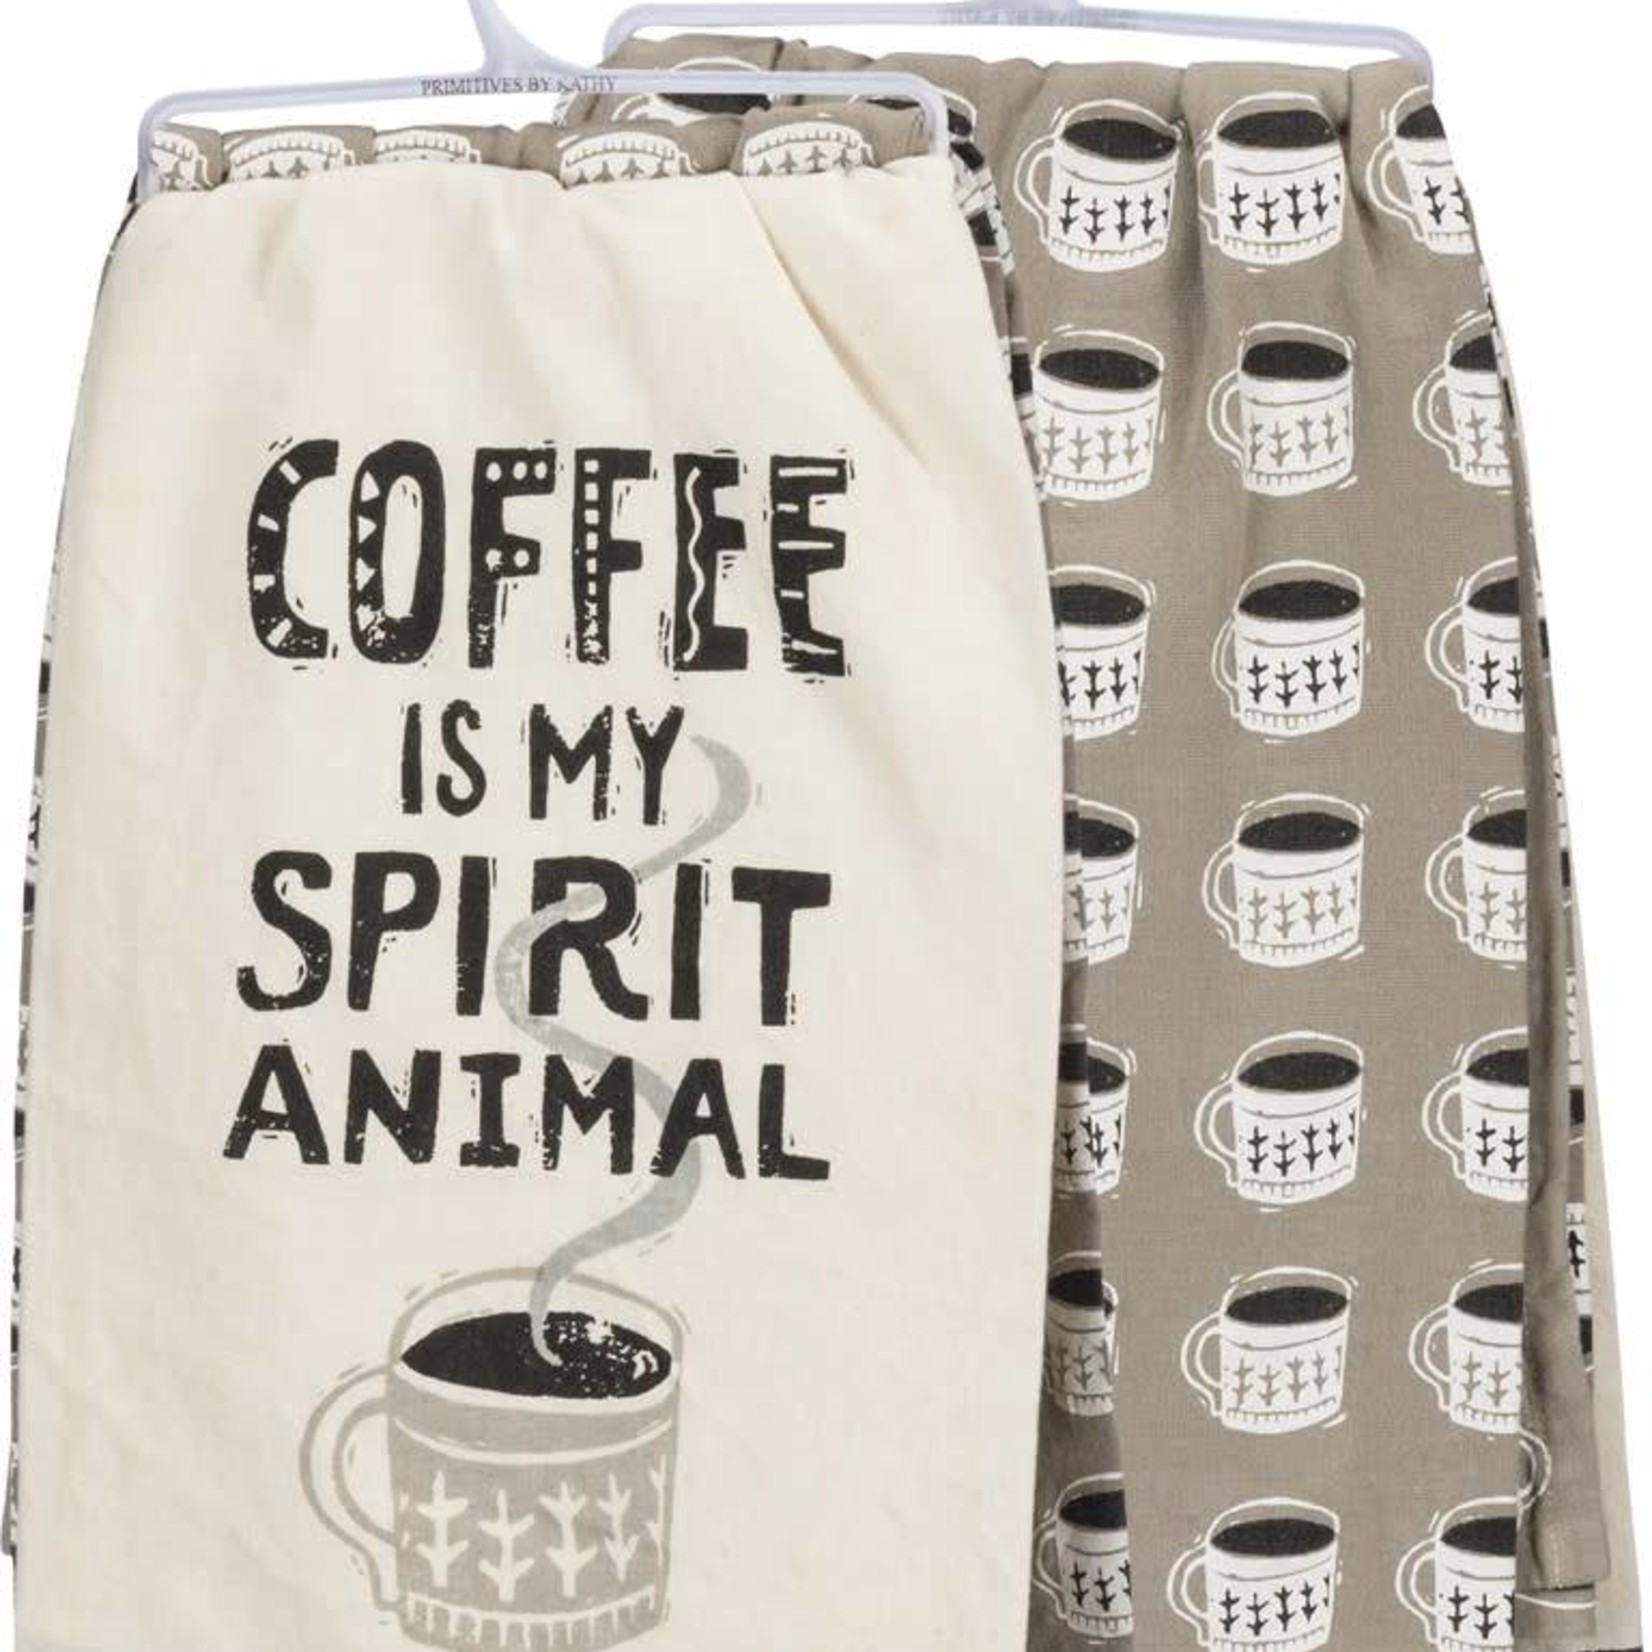 Coffee Is My Spirit Animal Dish Towel Set 35052